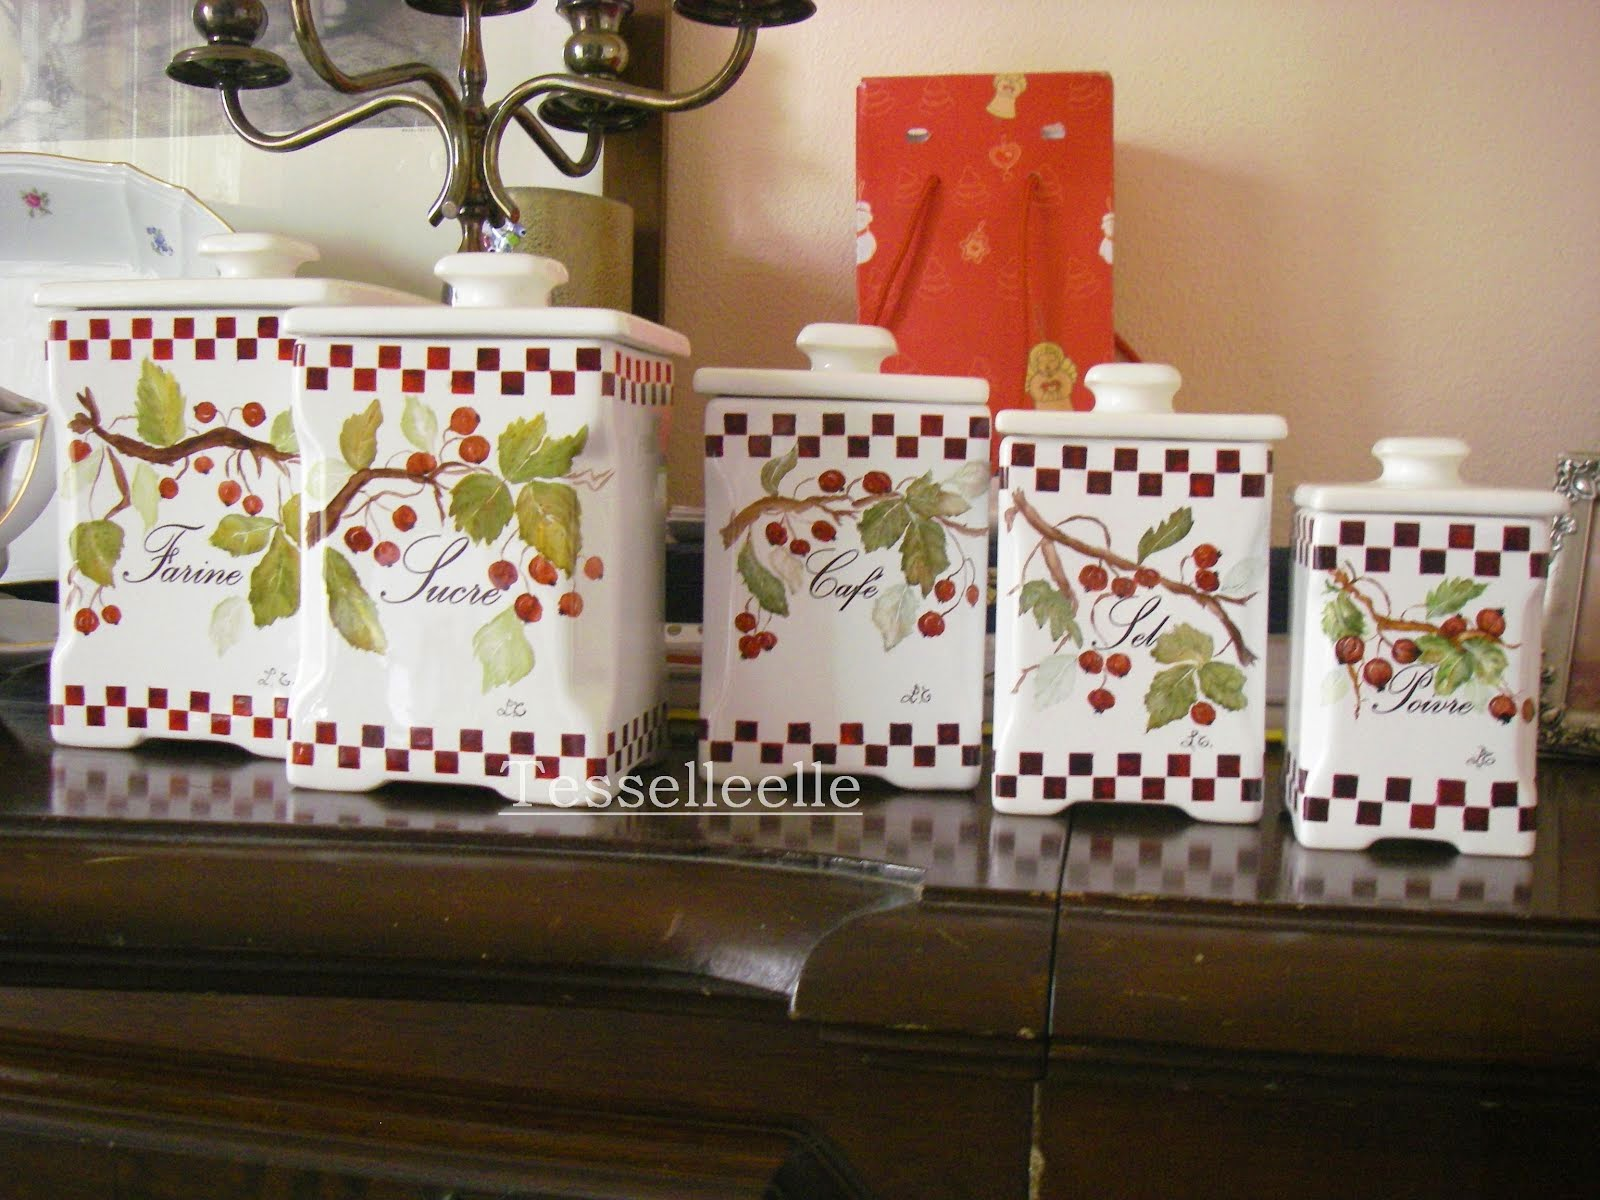 Set barattoli da cucina dipinti a mano 3° fuoco